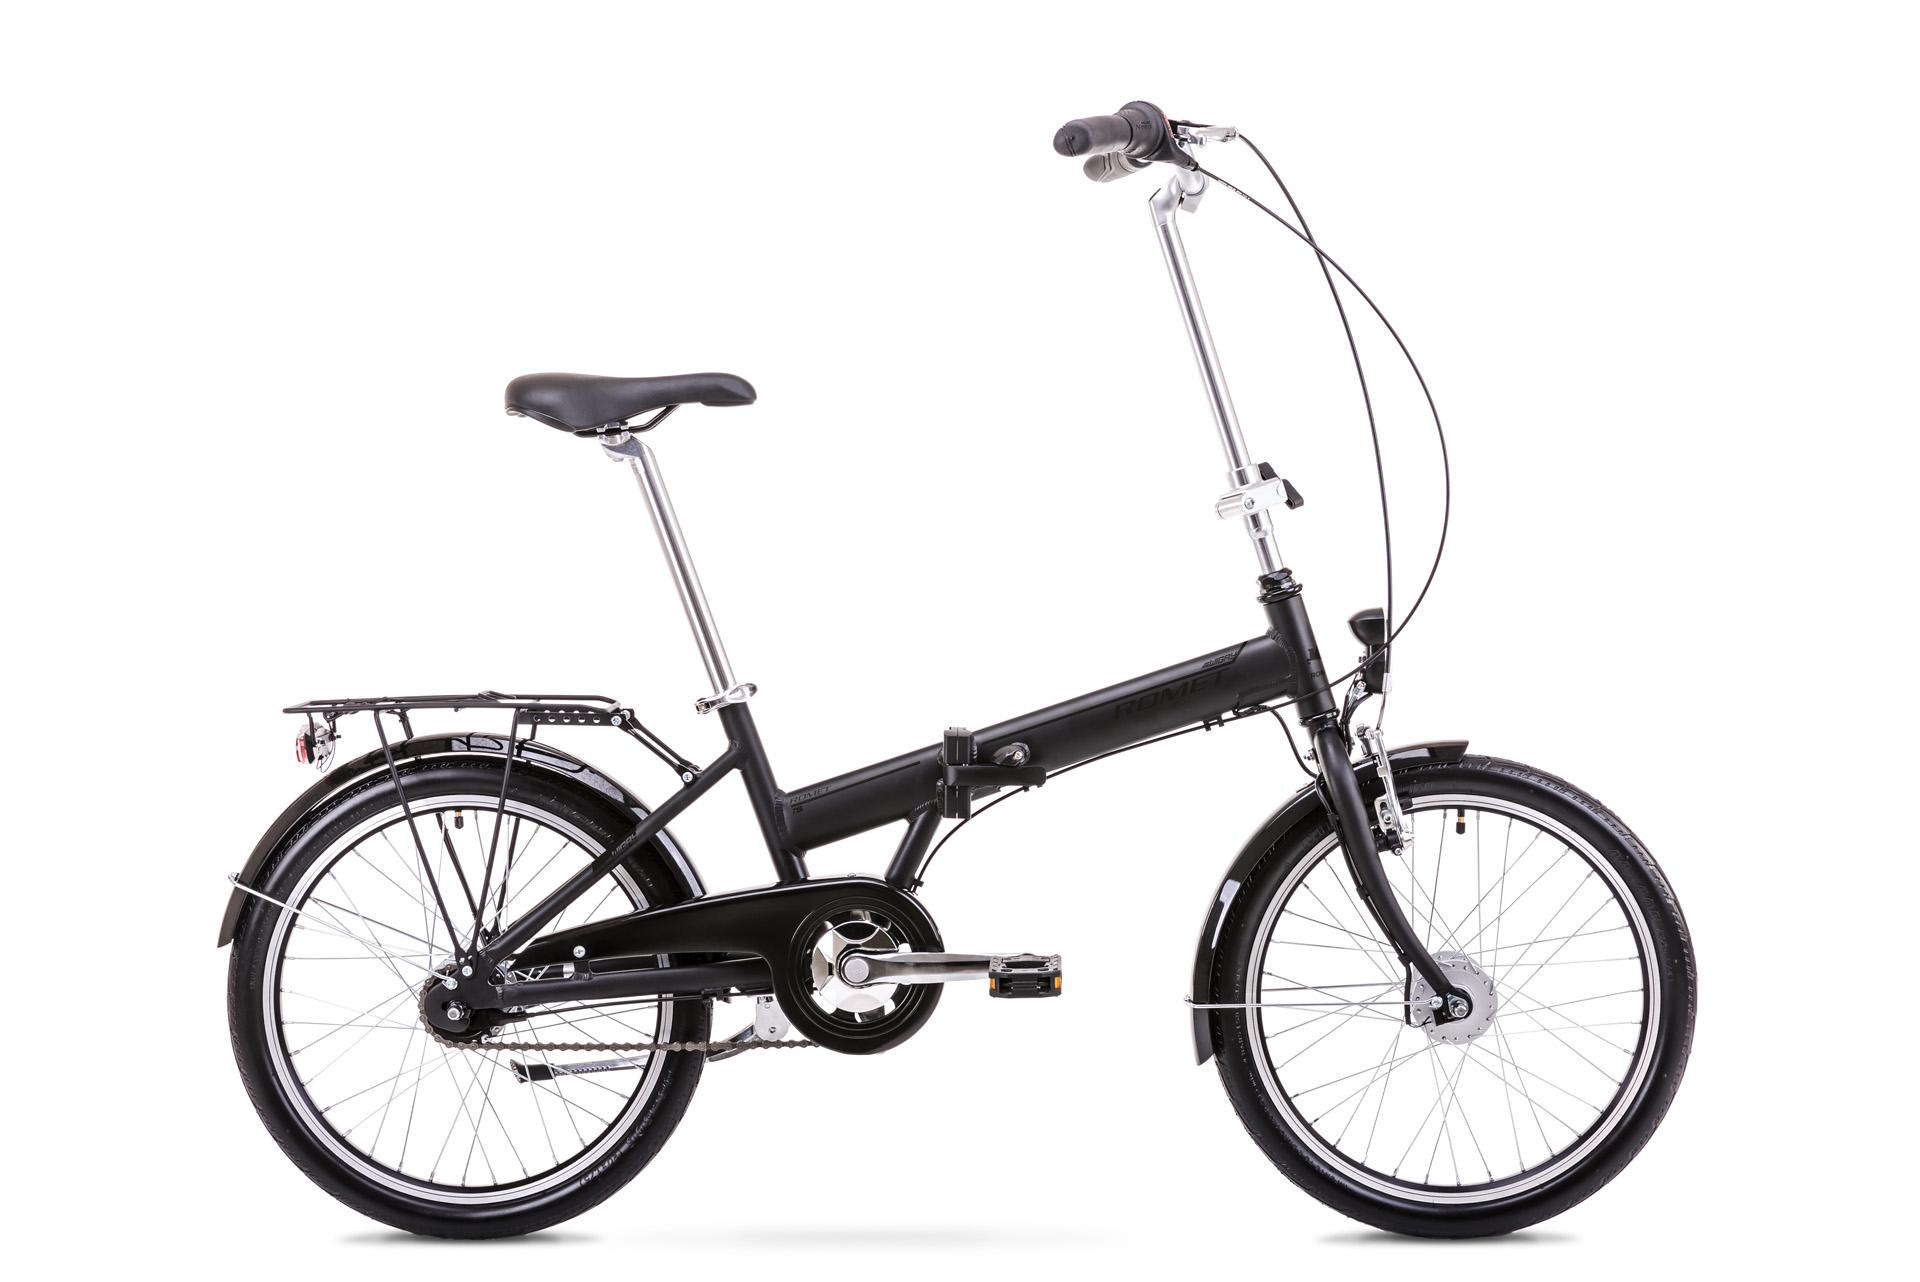 Bicicleta pliabila Unisex Romet Wigry 4 Negru/Gri 2019 imagine